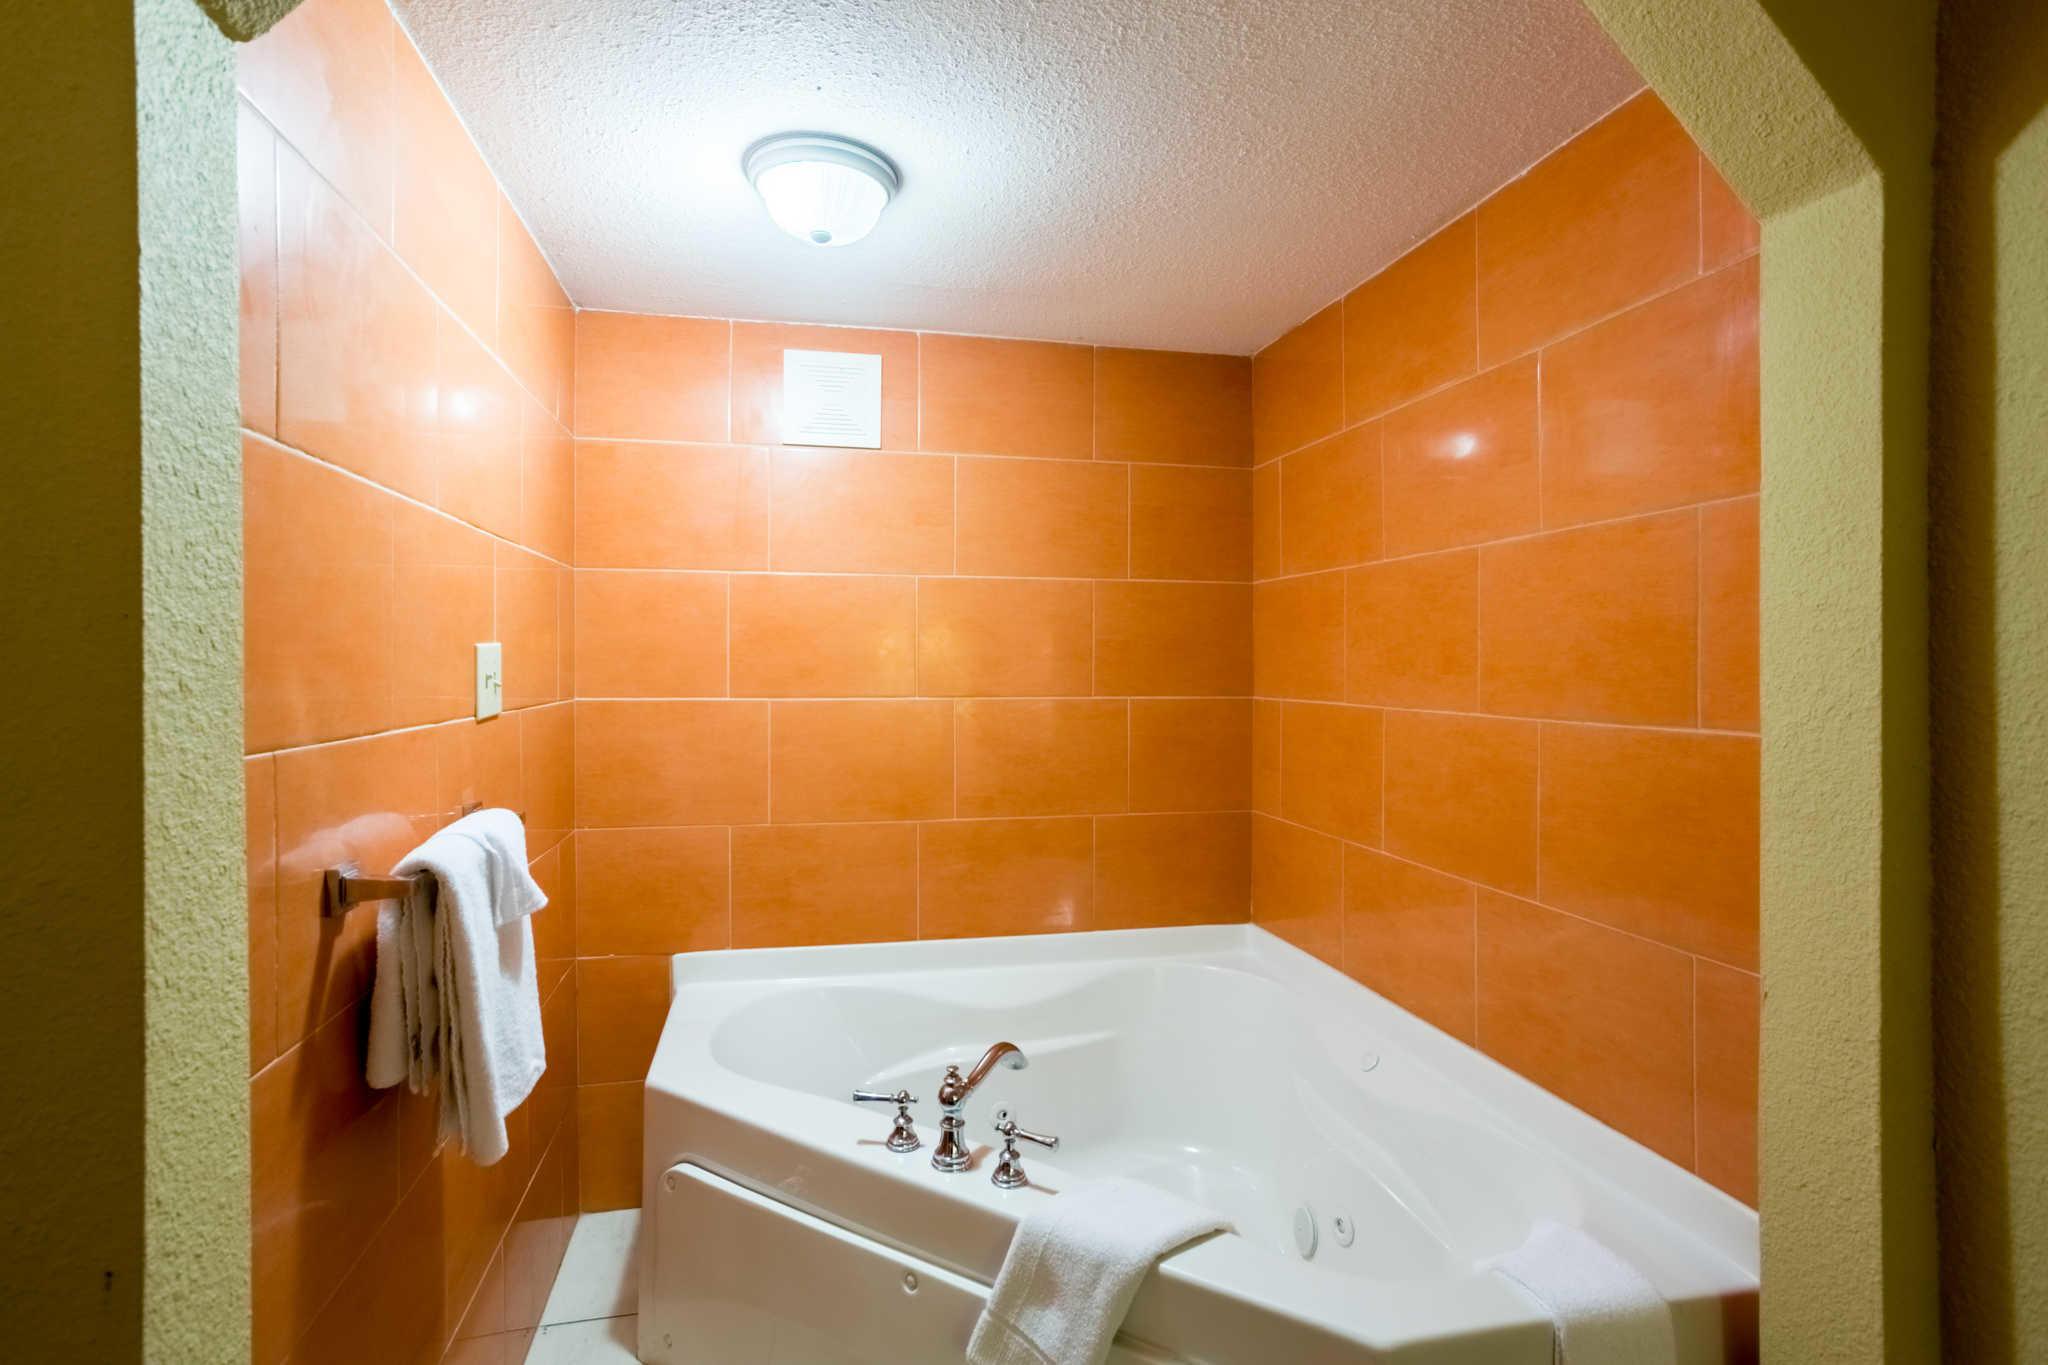 Econo Lodge image 36